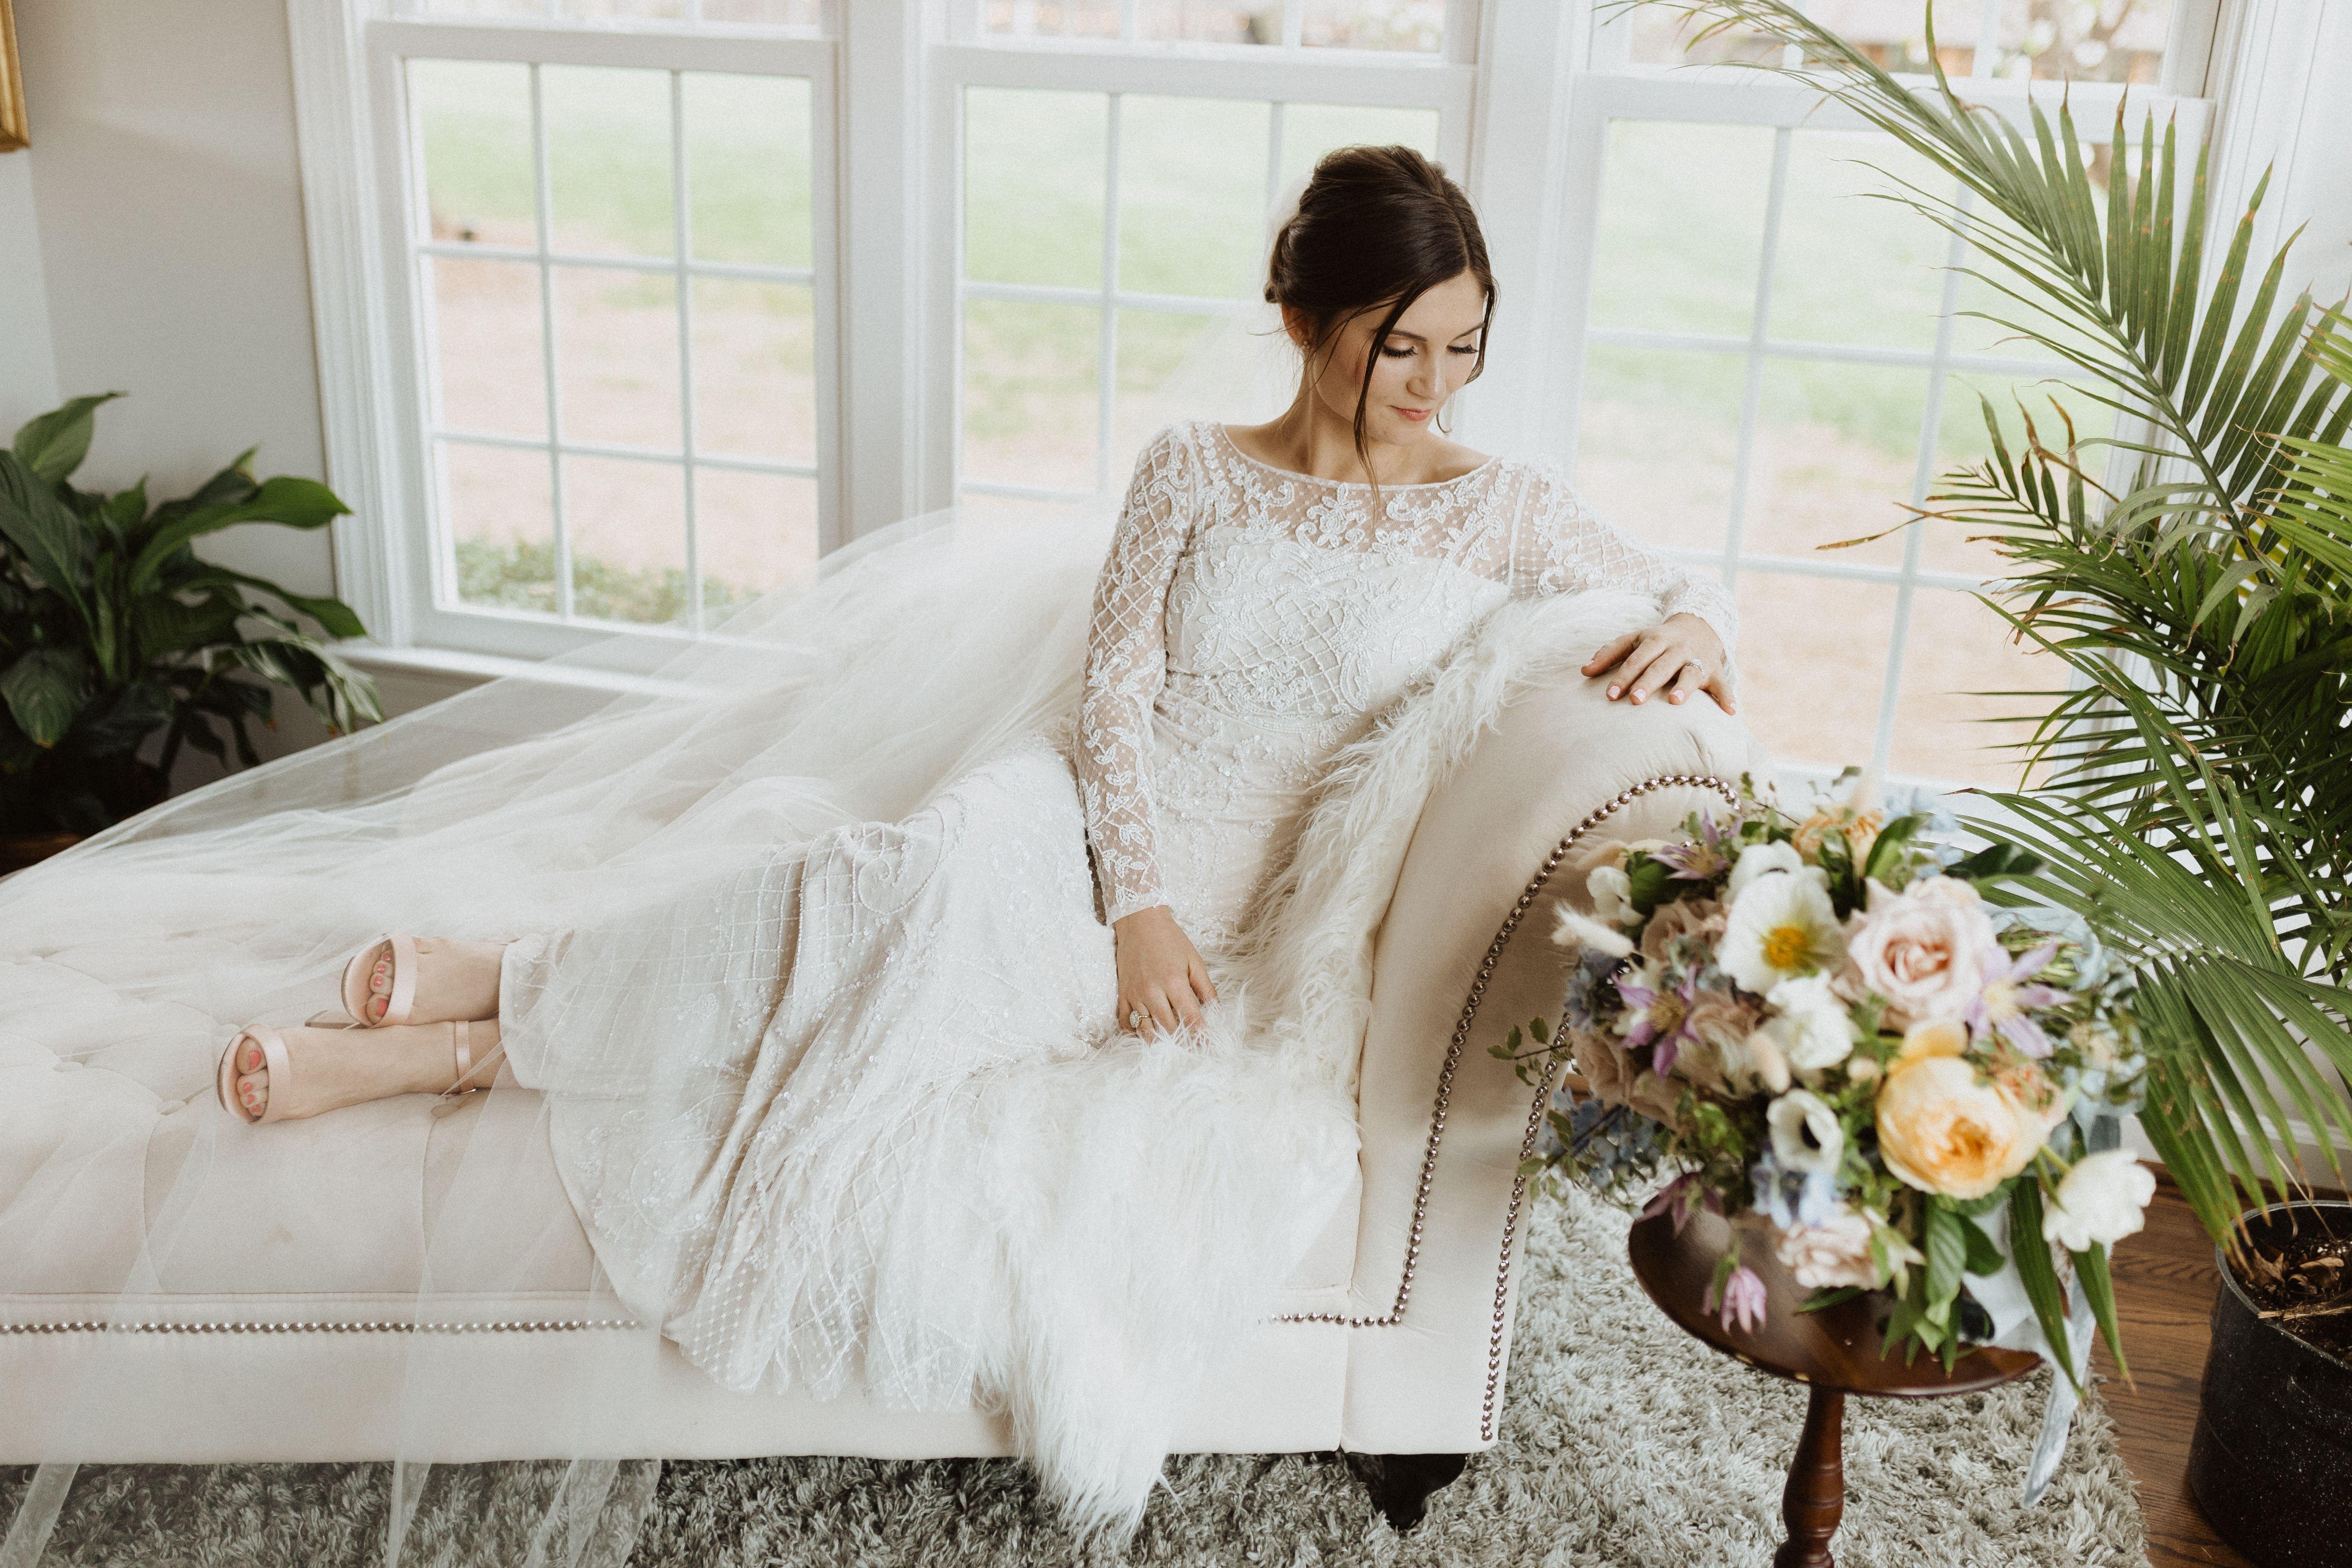 Bridal photography in 2020 best wedding planner elope